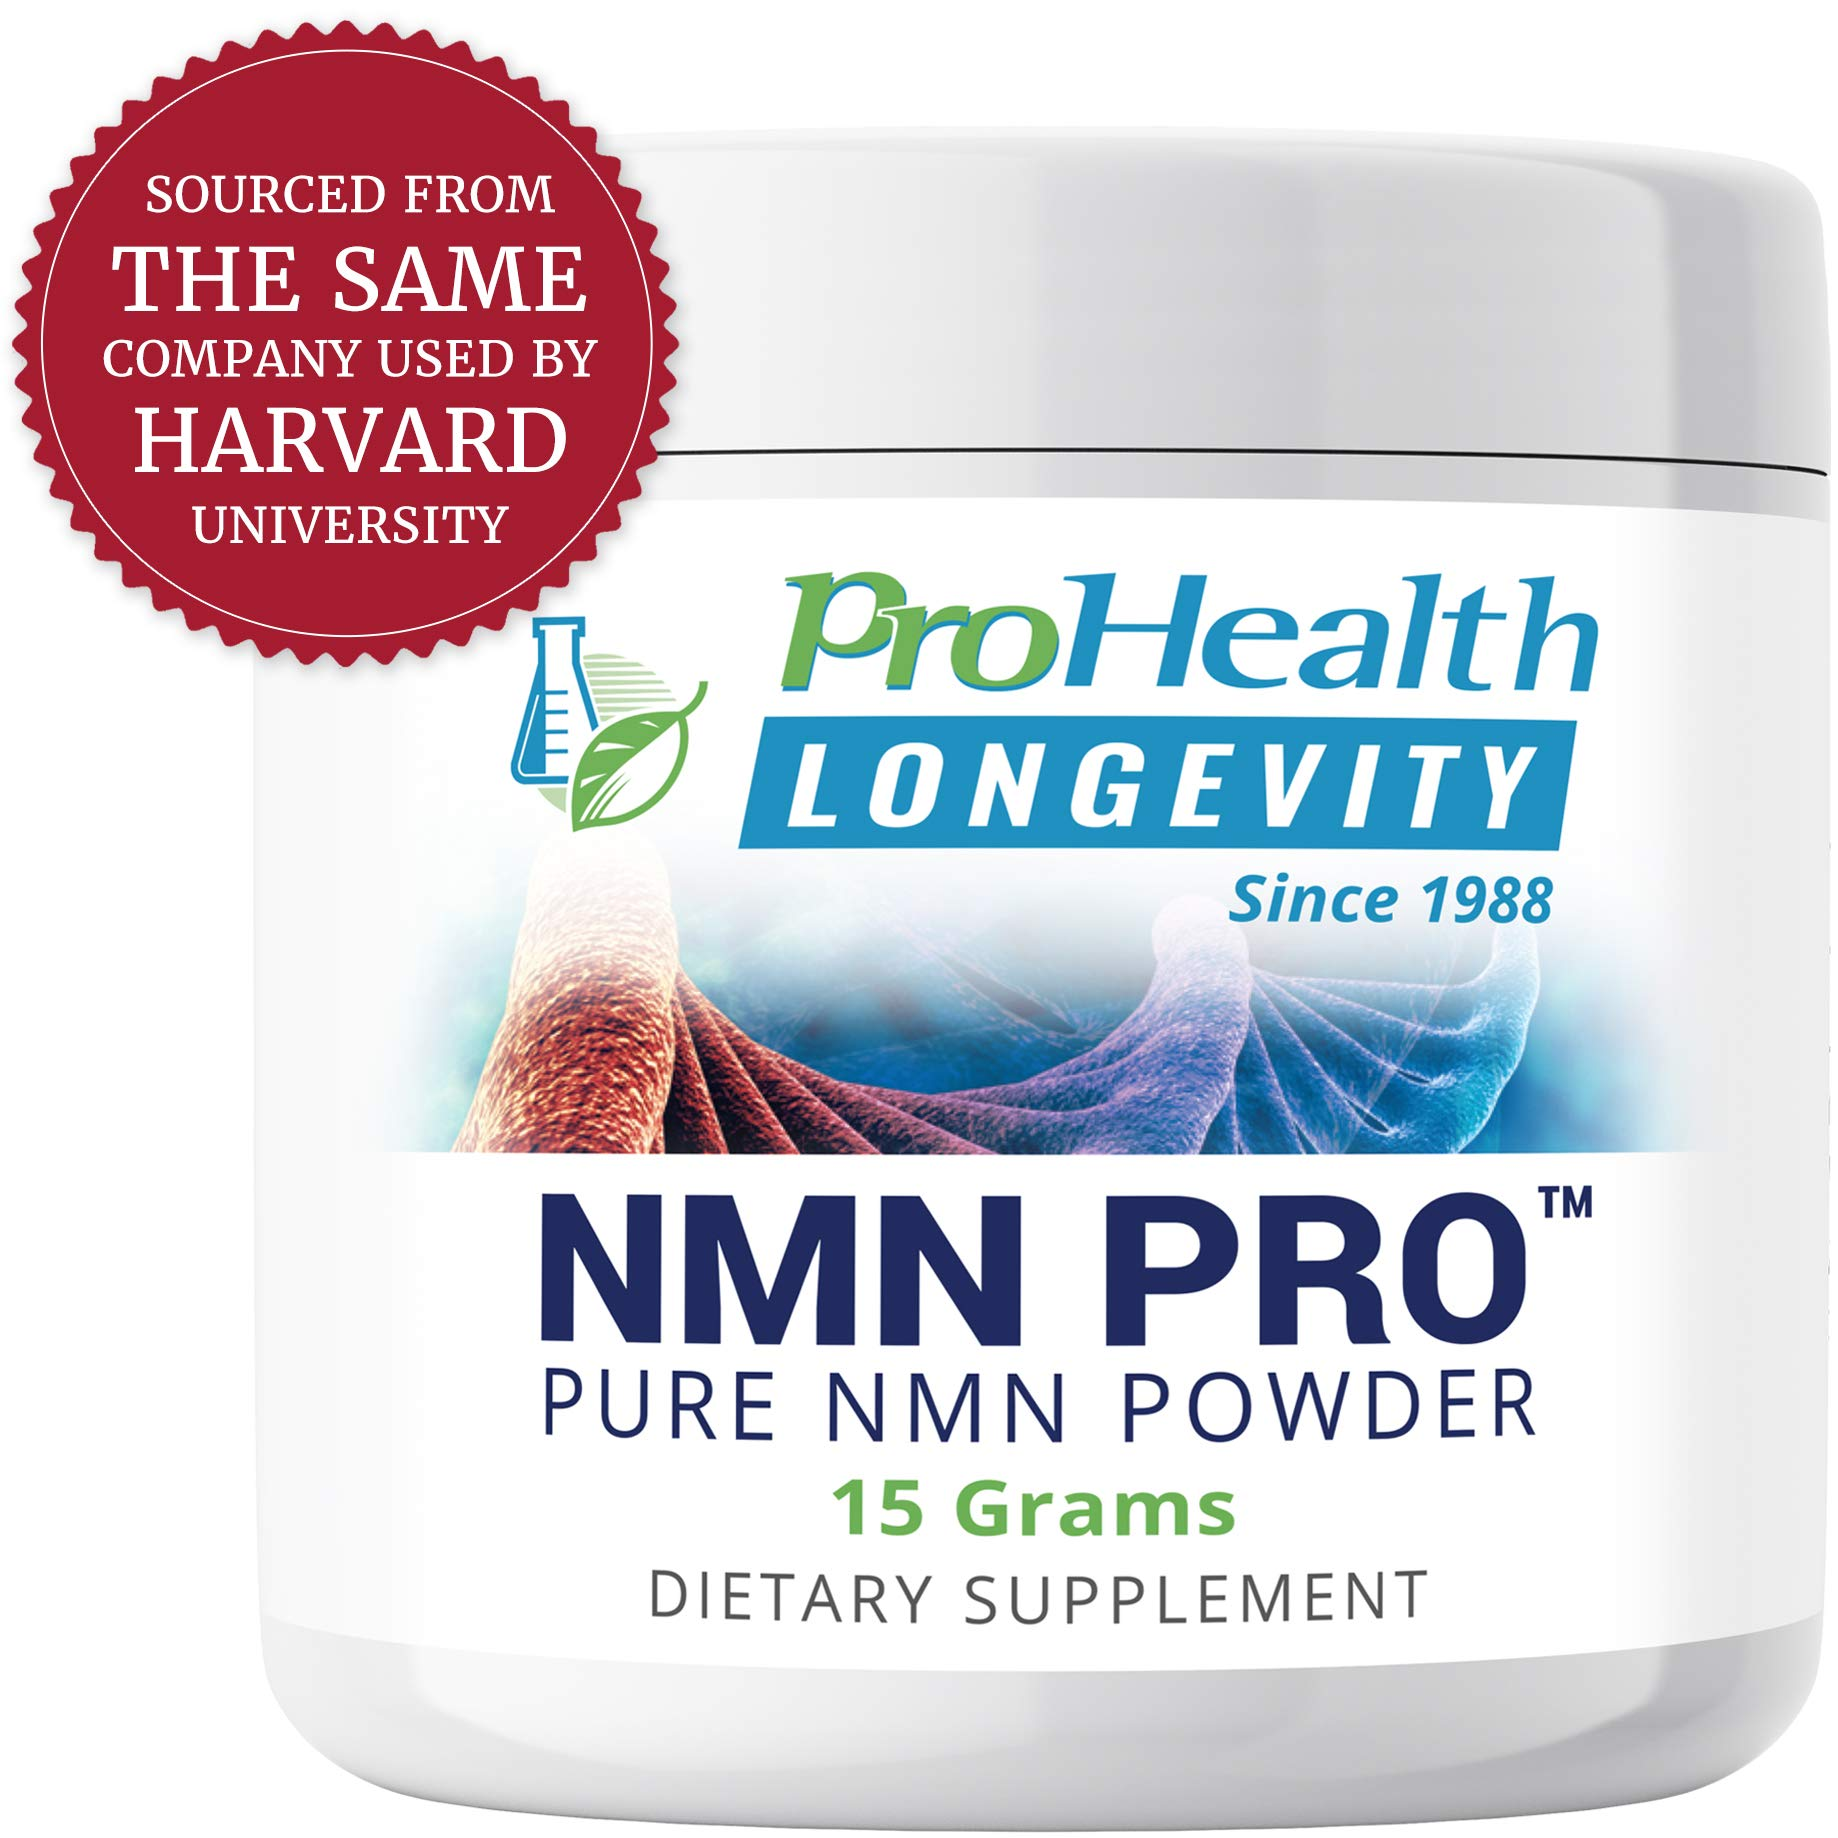 ProHealth NMN Powder (15 Grams) Nicotinamide Mononucleotide | NAD+ Precursor | Supports Anti-Aging, Longevity and Energy | Non-GMO by ProHealth